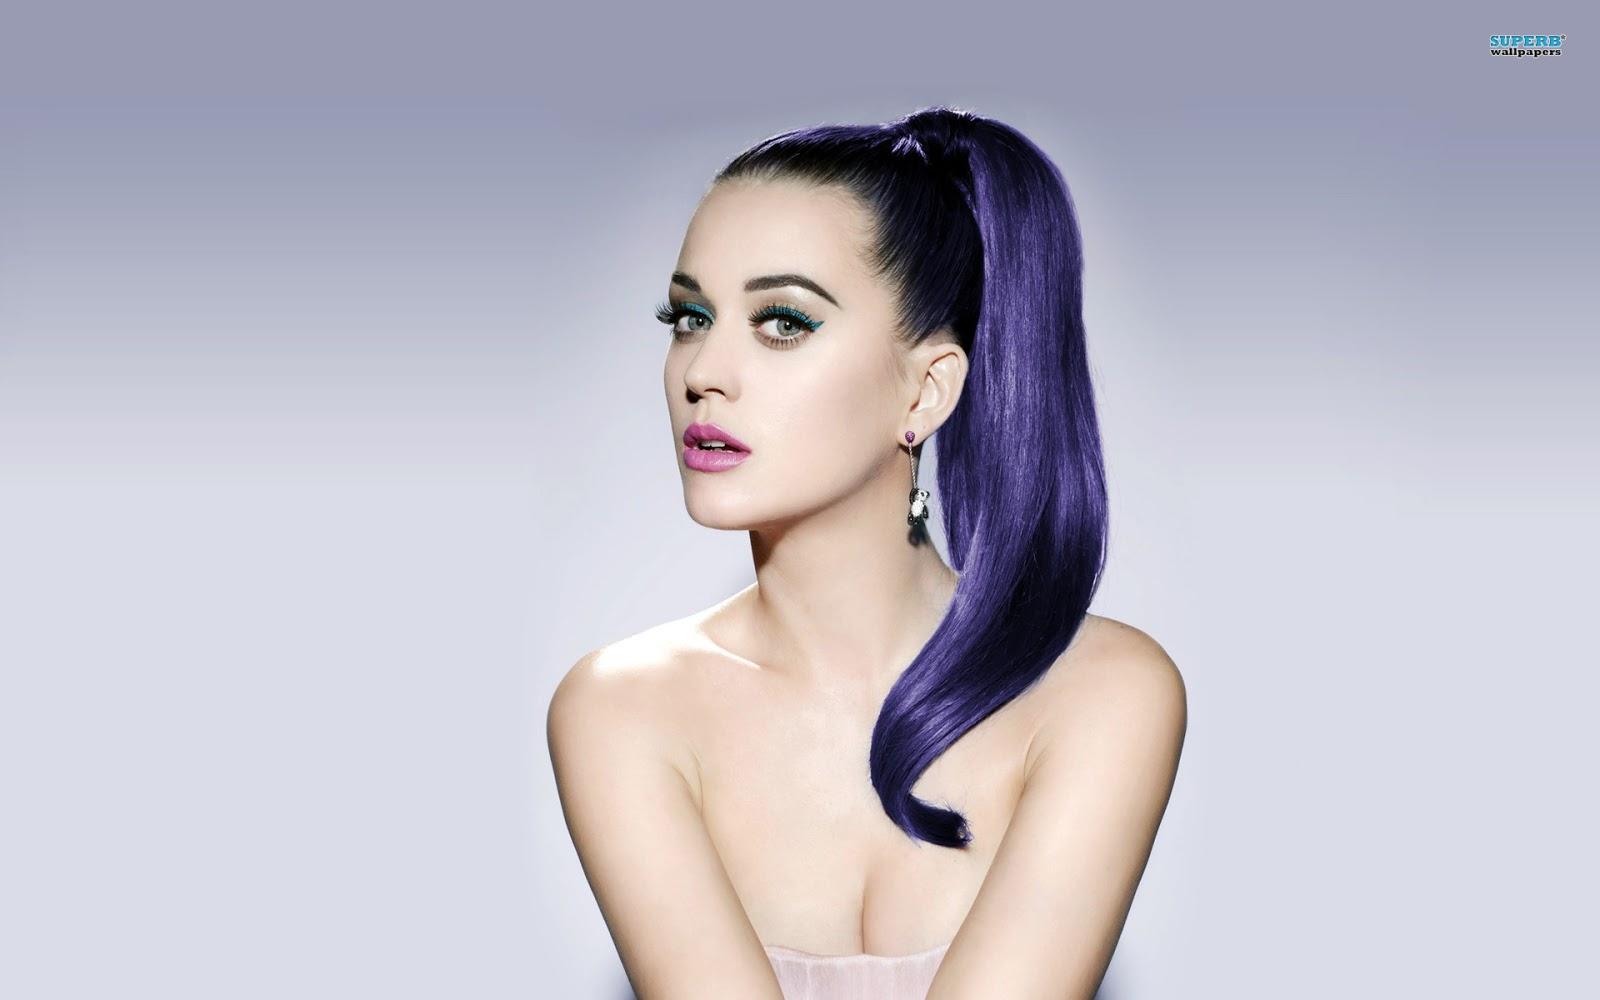 Katy Perry: Katy Perry: Katy Perry No Top